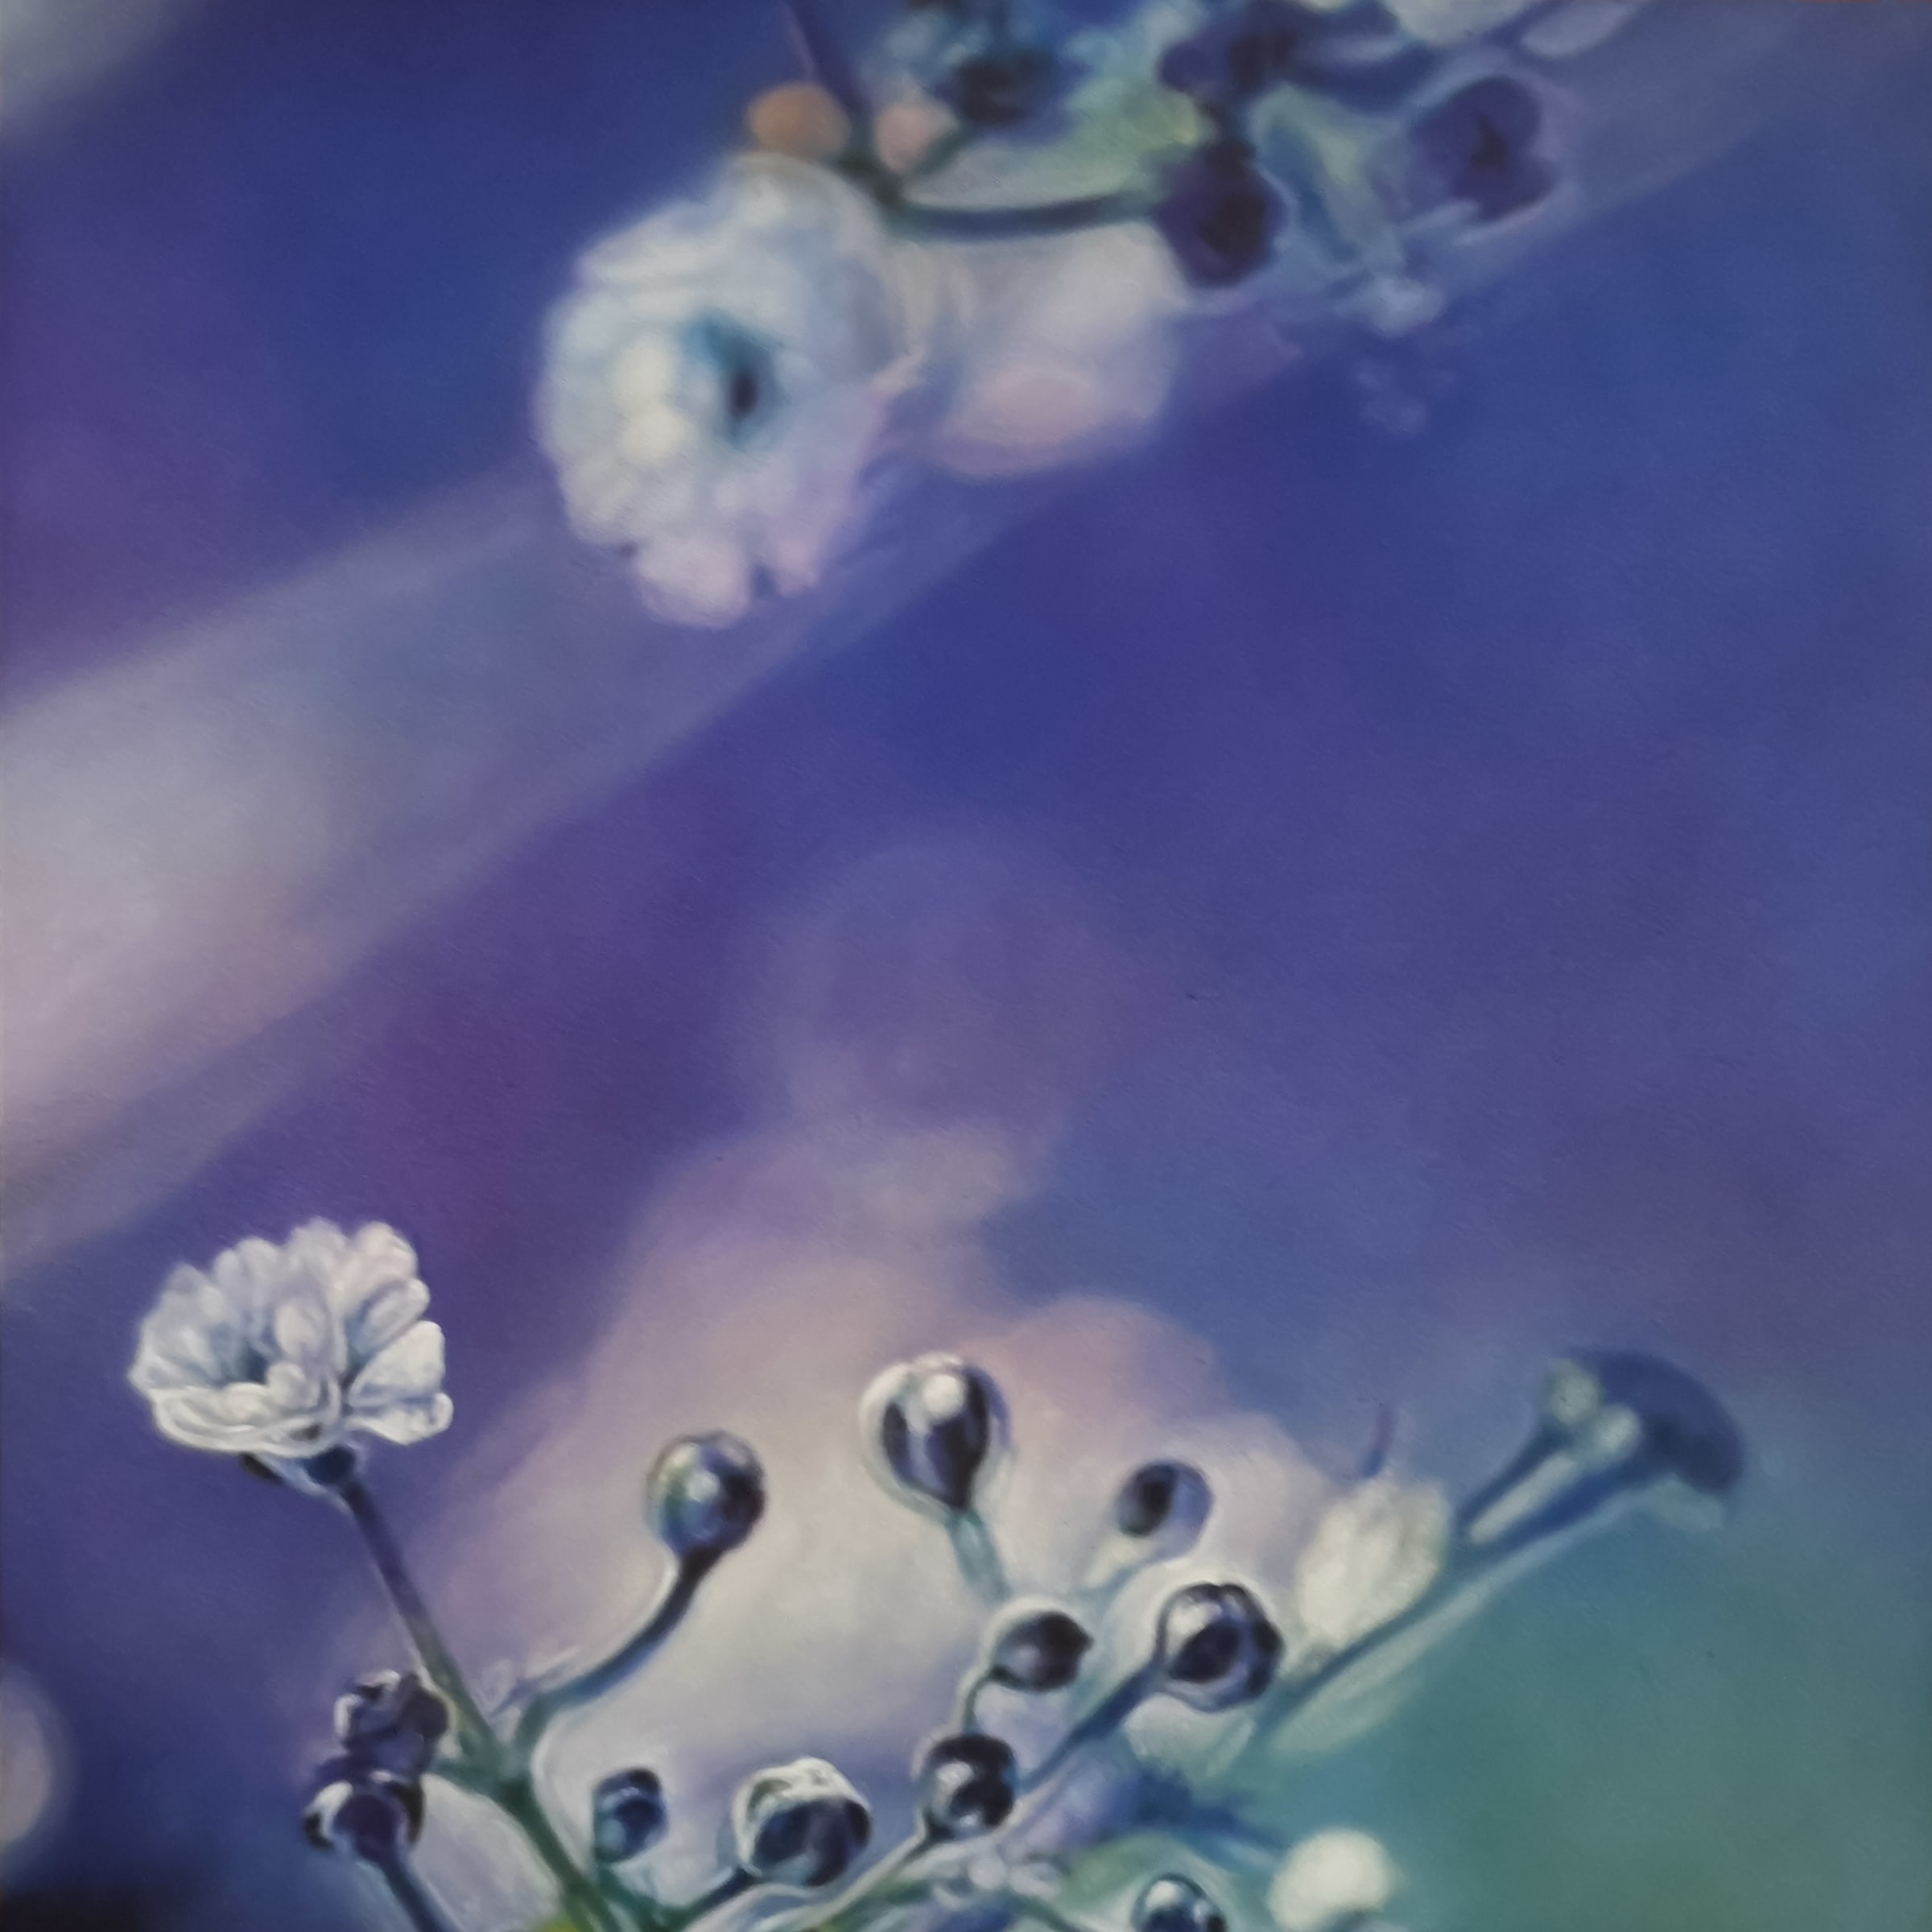 <span class=&#34;link fancybox-details-link&#34;><a href=&#34;/artists/73-sascha-%26-tashi-stylianou/works/1216-sascha-tashi-stylianou-floral-happiness-4-2018/&#34;>View Detail Page</a></span><div class=&#34;artist&#34;><strong>Sascha & Tashi Stylianou</strong></div> <div class=&#34;title&#34;><em>Floral Happiness 4</em>, 2018</div> <div class=&#34;medium&#34;>Acrylic In Brush & Spray On Canvas</div> <div class=&#34;dimensions&#34;>100cm x 100cm</div><div class=&#34;price&#34;>R10,000.00</div>